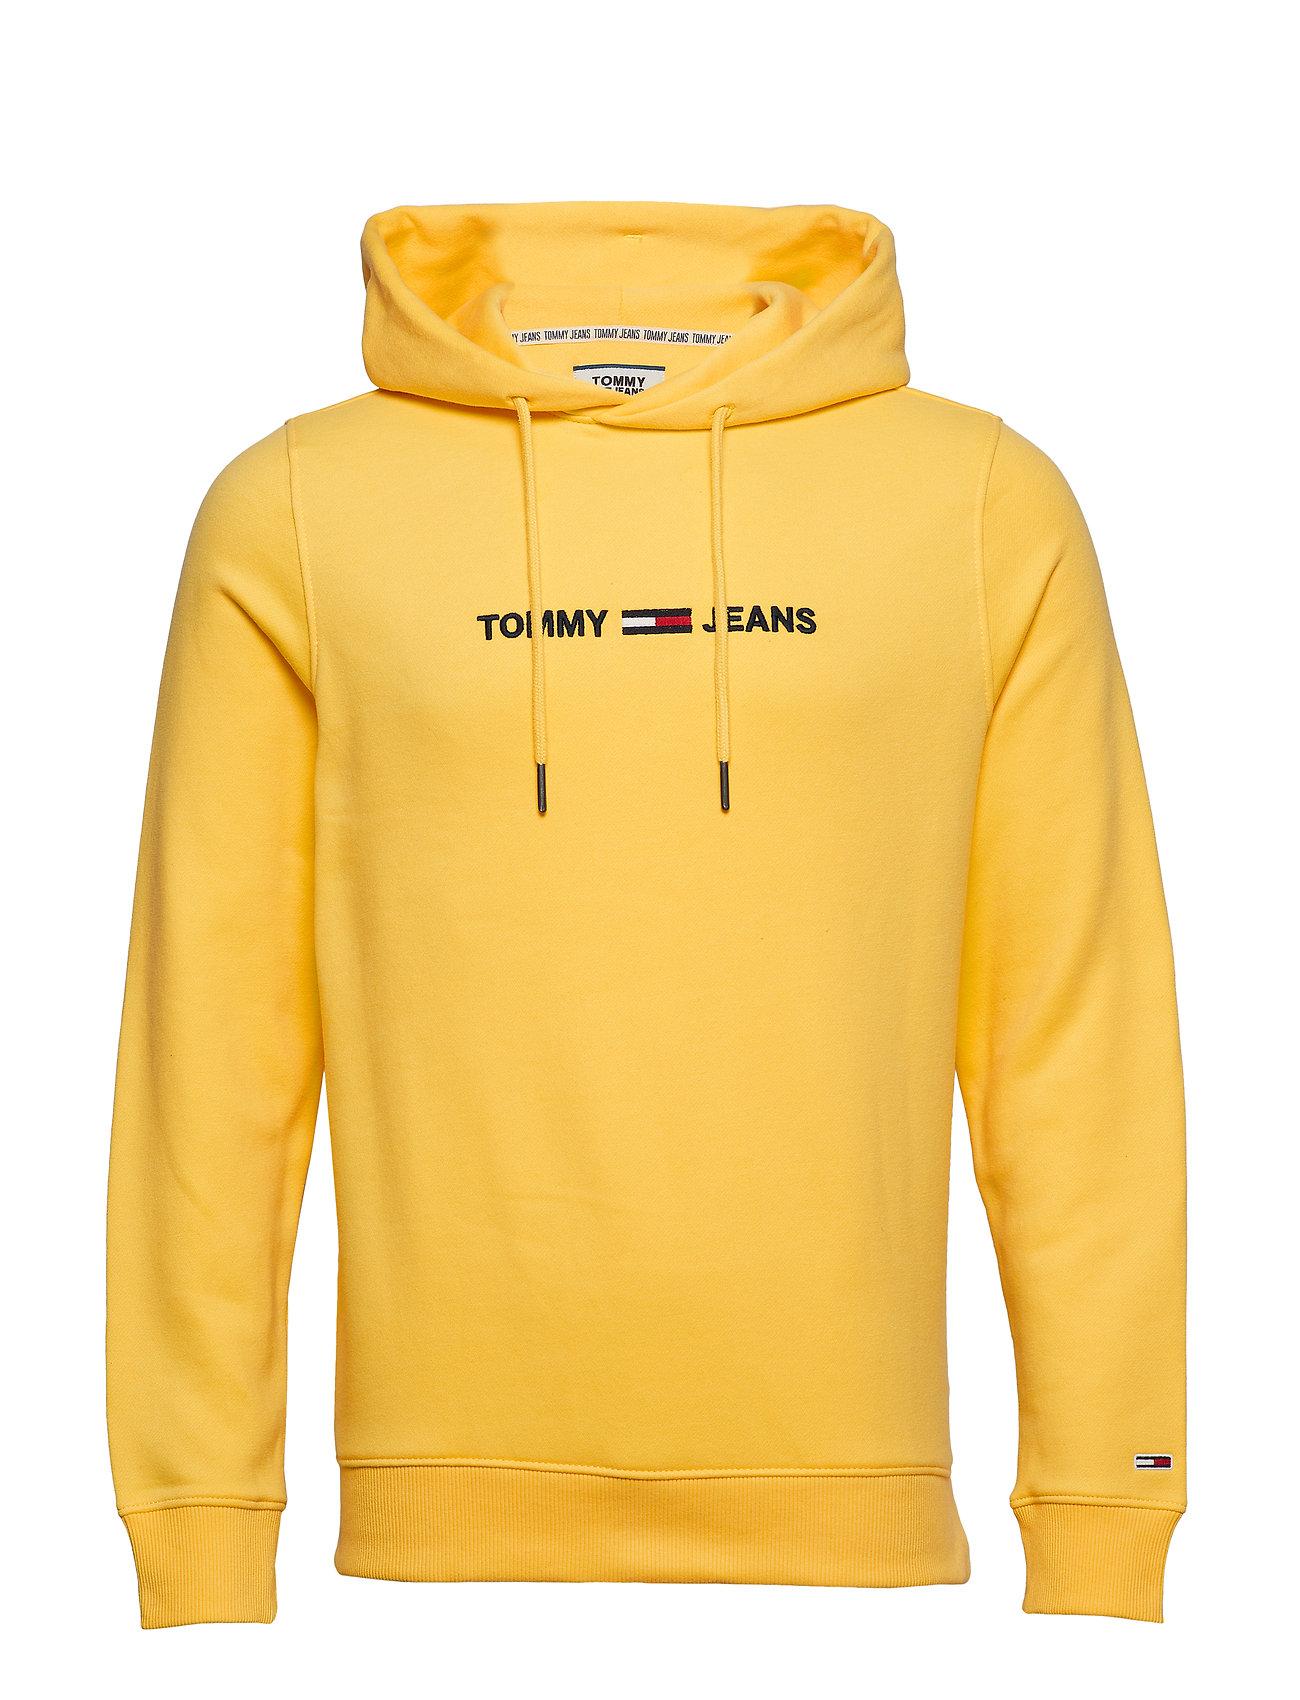 Tommy Jeans TJM STRAIGHT LOGO HOODIE - ASPEN GOLD